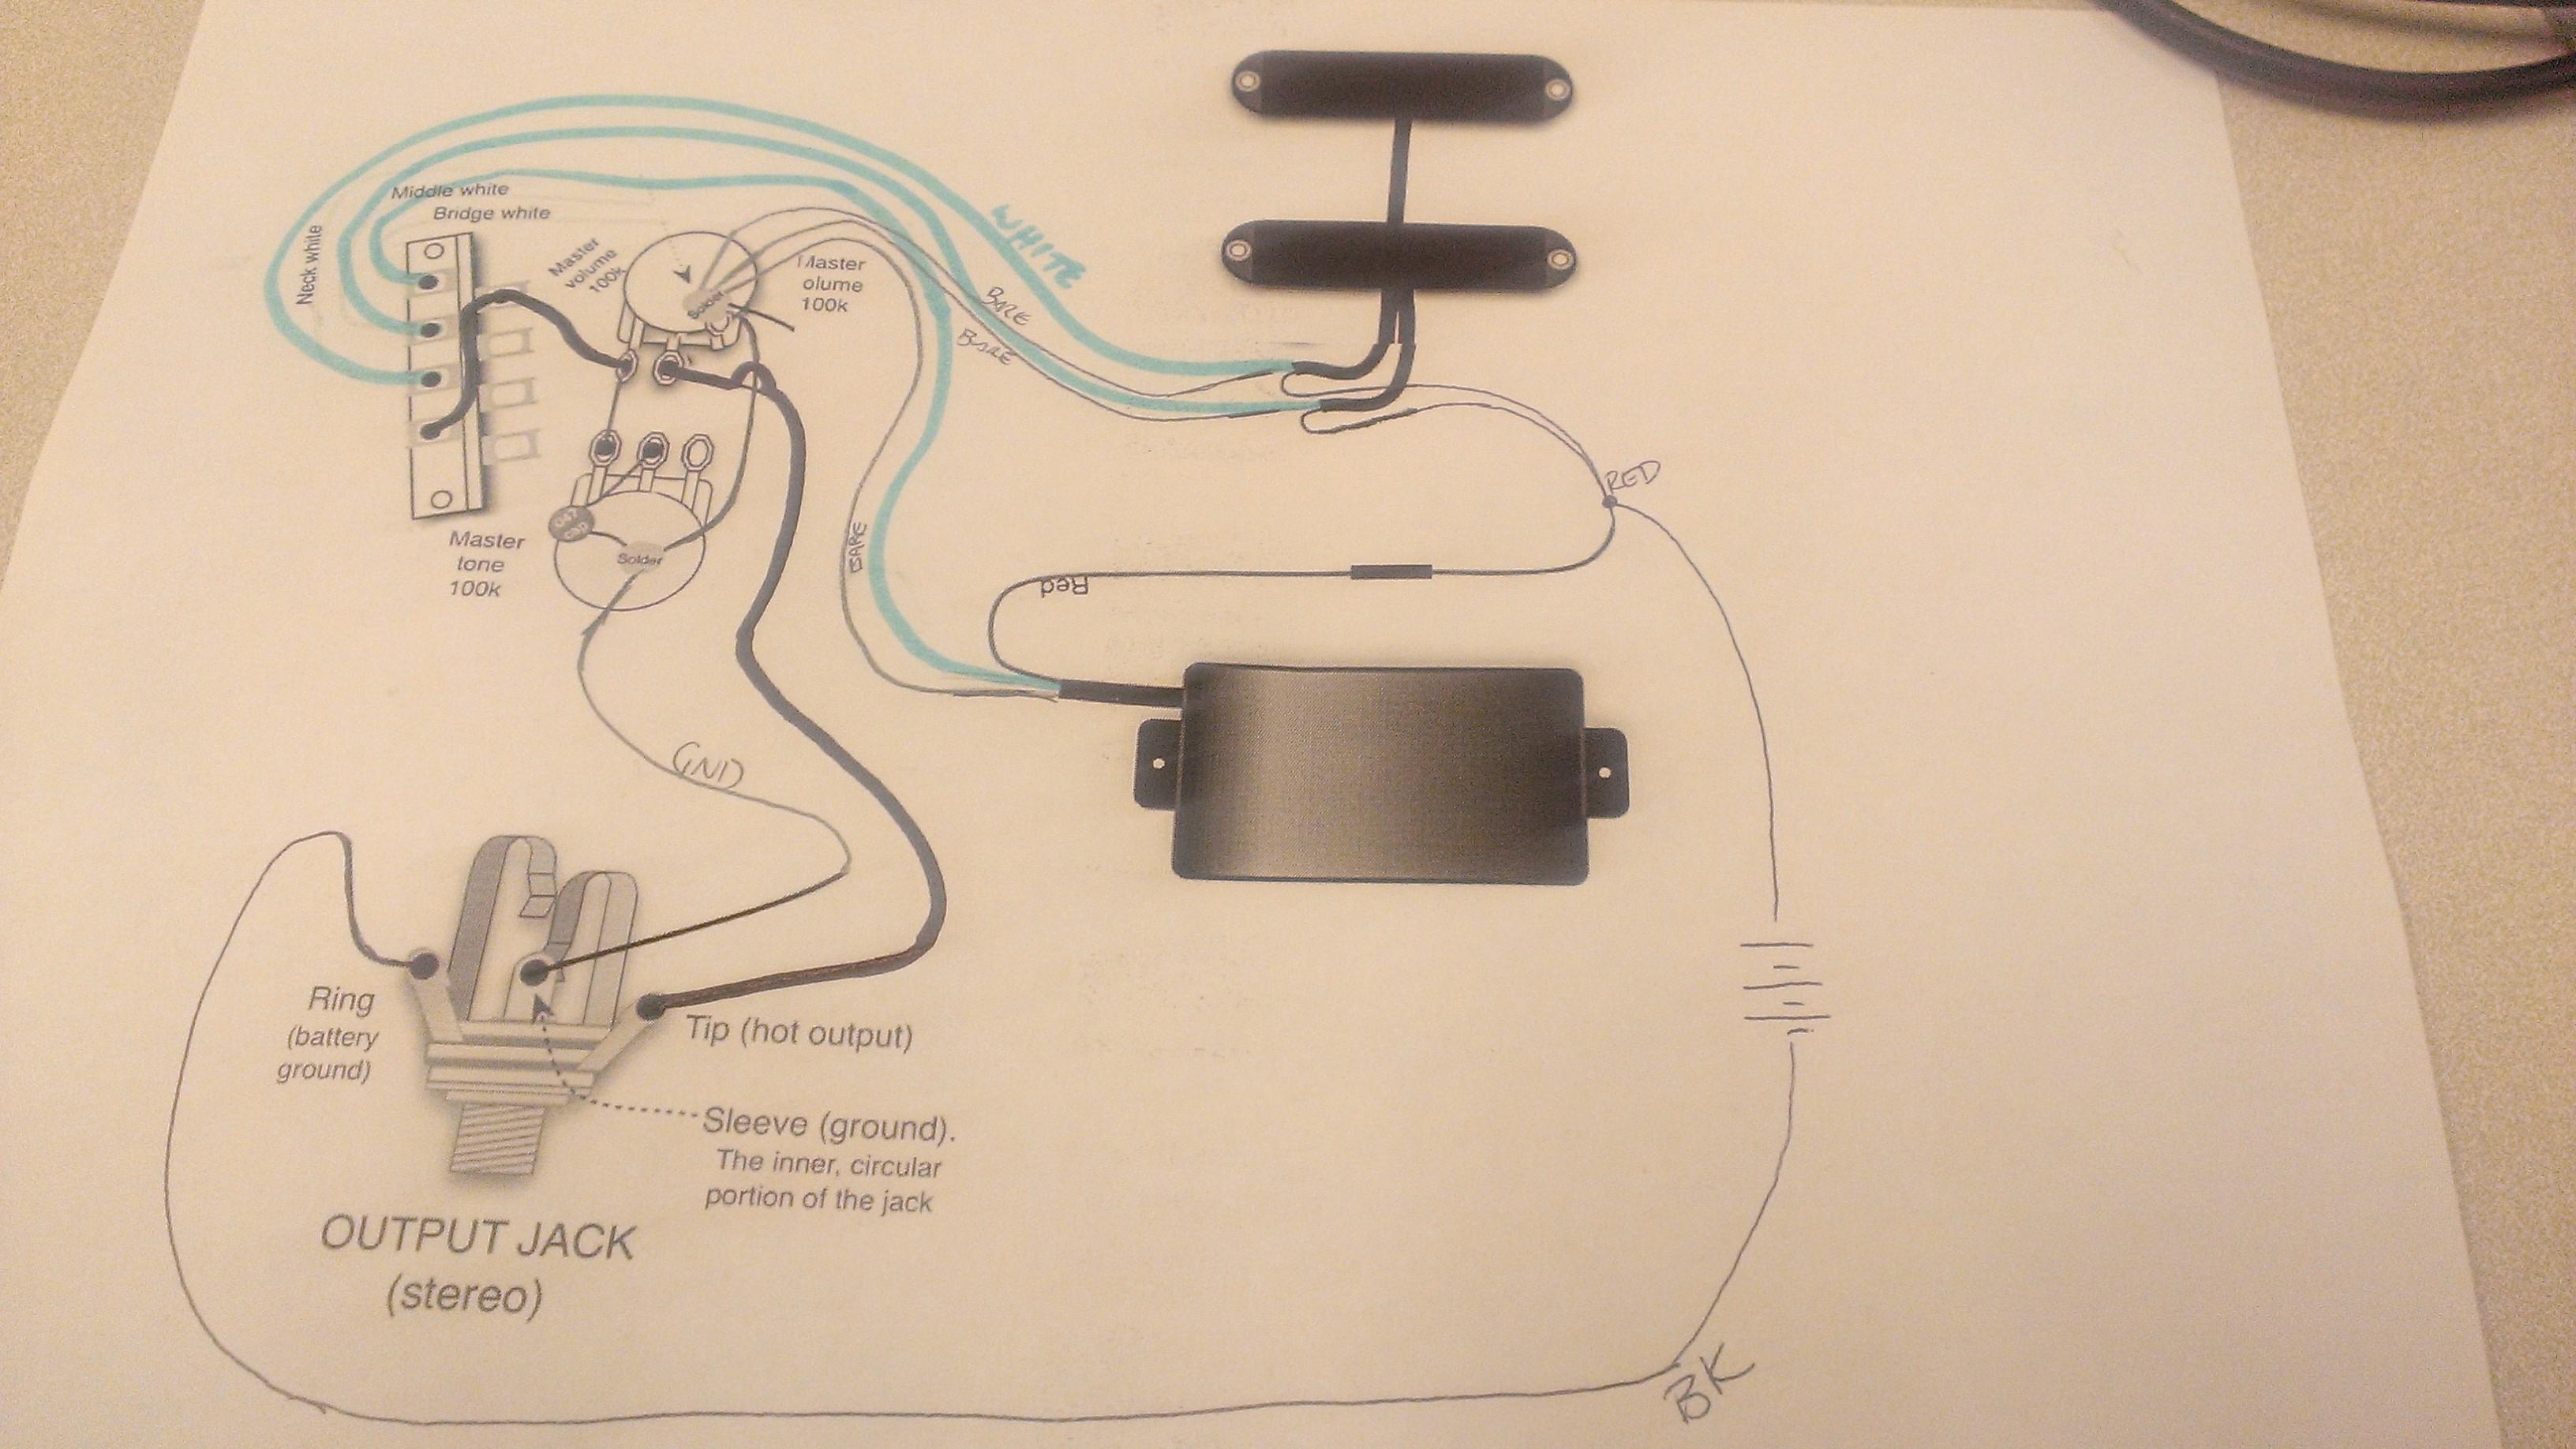 medium resolution of jackson soloist wiring diagram 30 wiring diagram images jackson humbucker wiring diagram jackson pickup wiring diagram